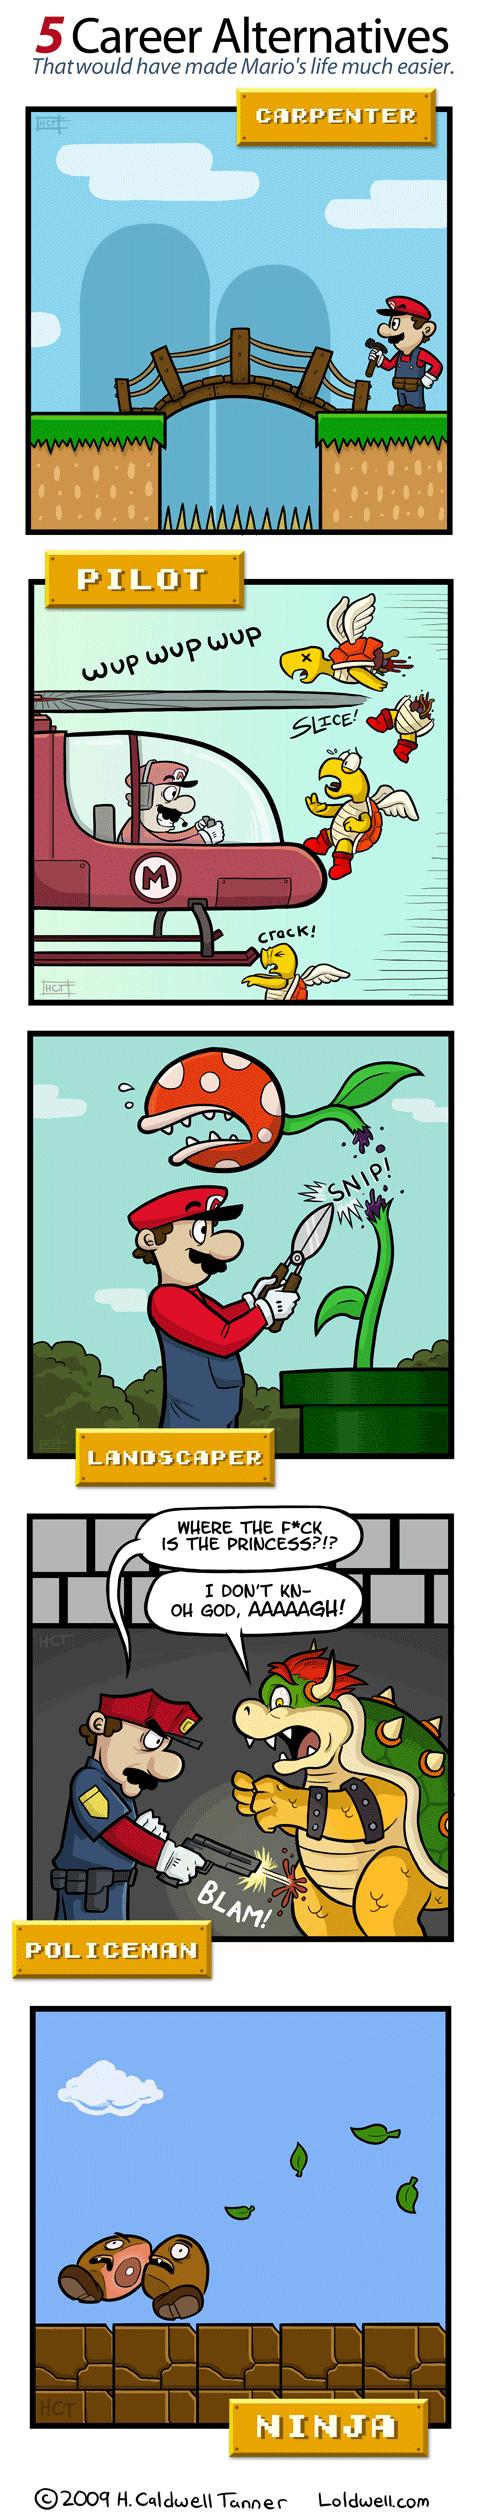 Better than Plumbing